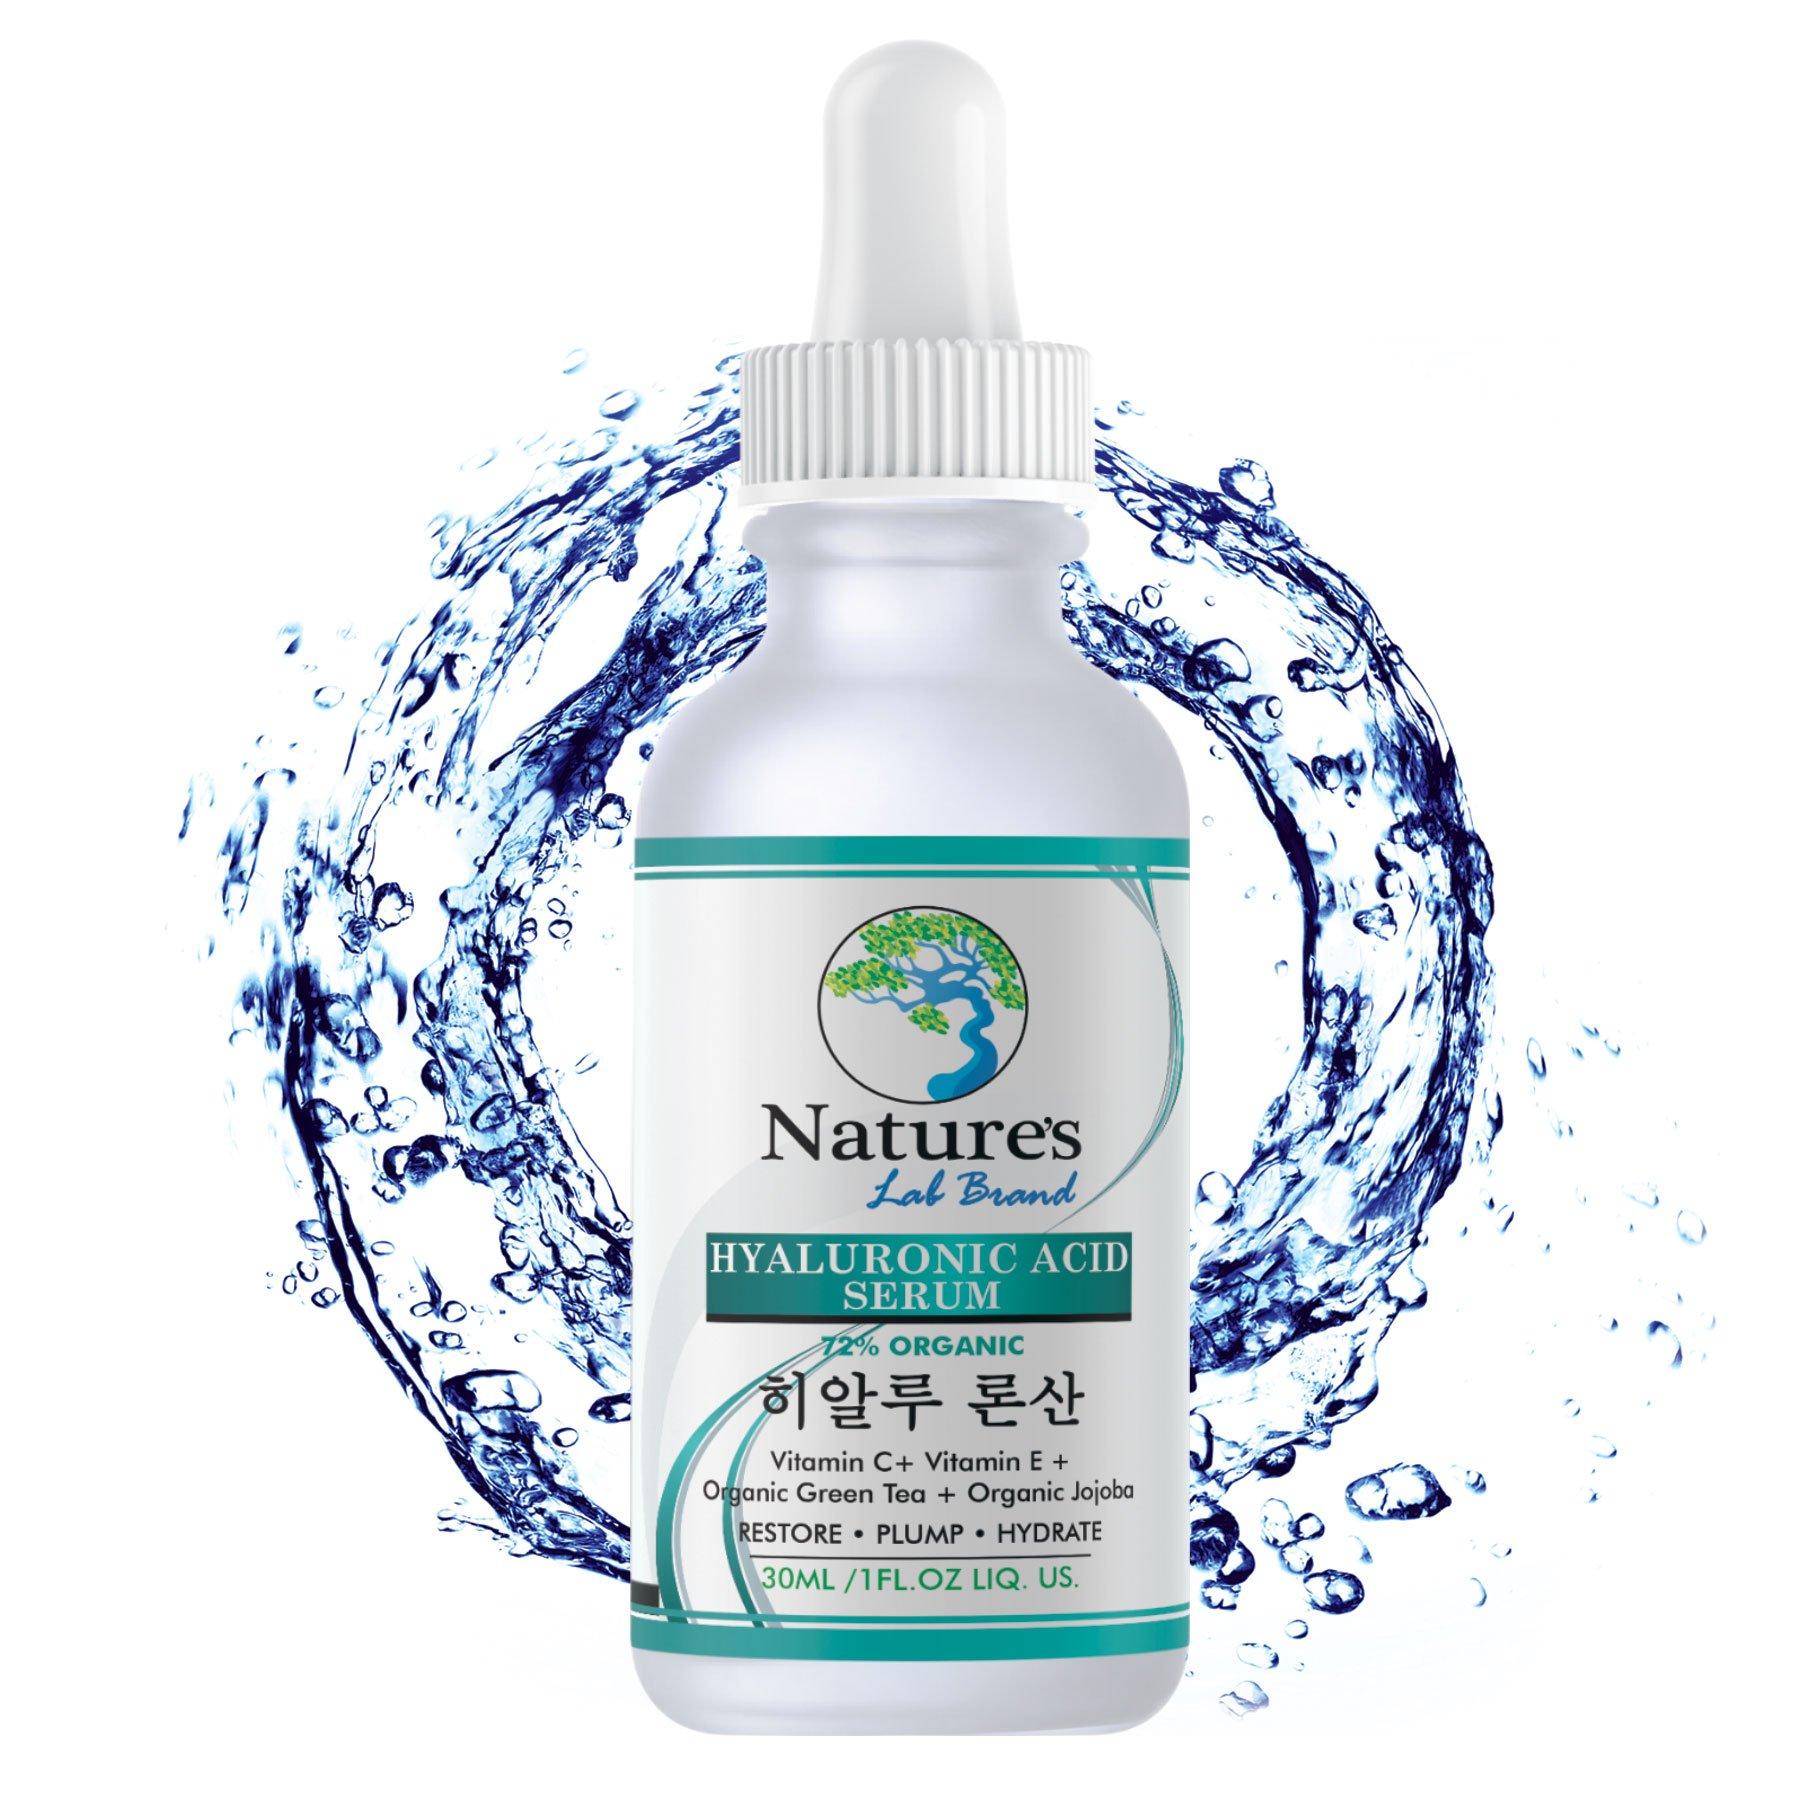 Organic Korean Beauty Hyaluronic Acid Serum for Face + Vitamin C Vitamin E – BEST Advanced Anti Aging formula Anti Wrinkle for whitening hydration all Natural Vegan Korean Skincare Natures Lab Brand